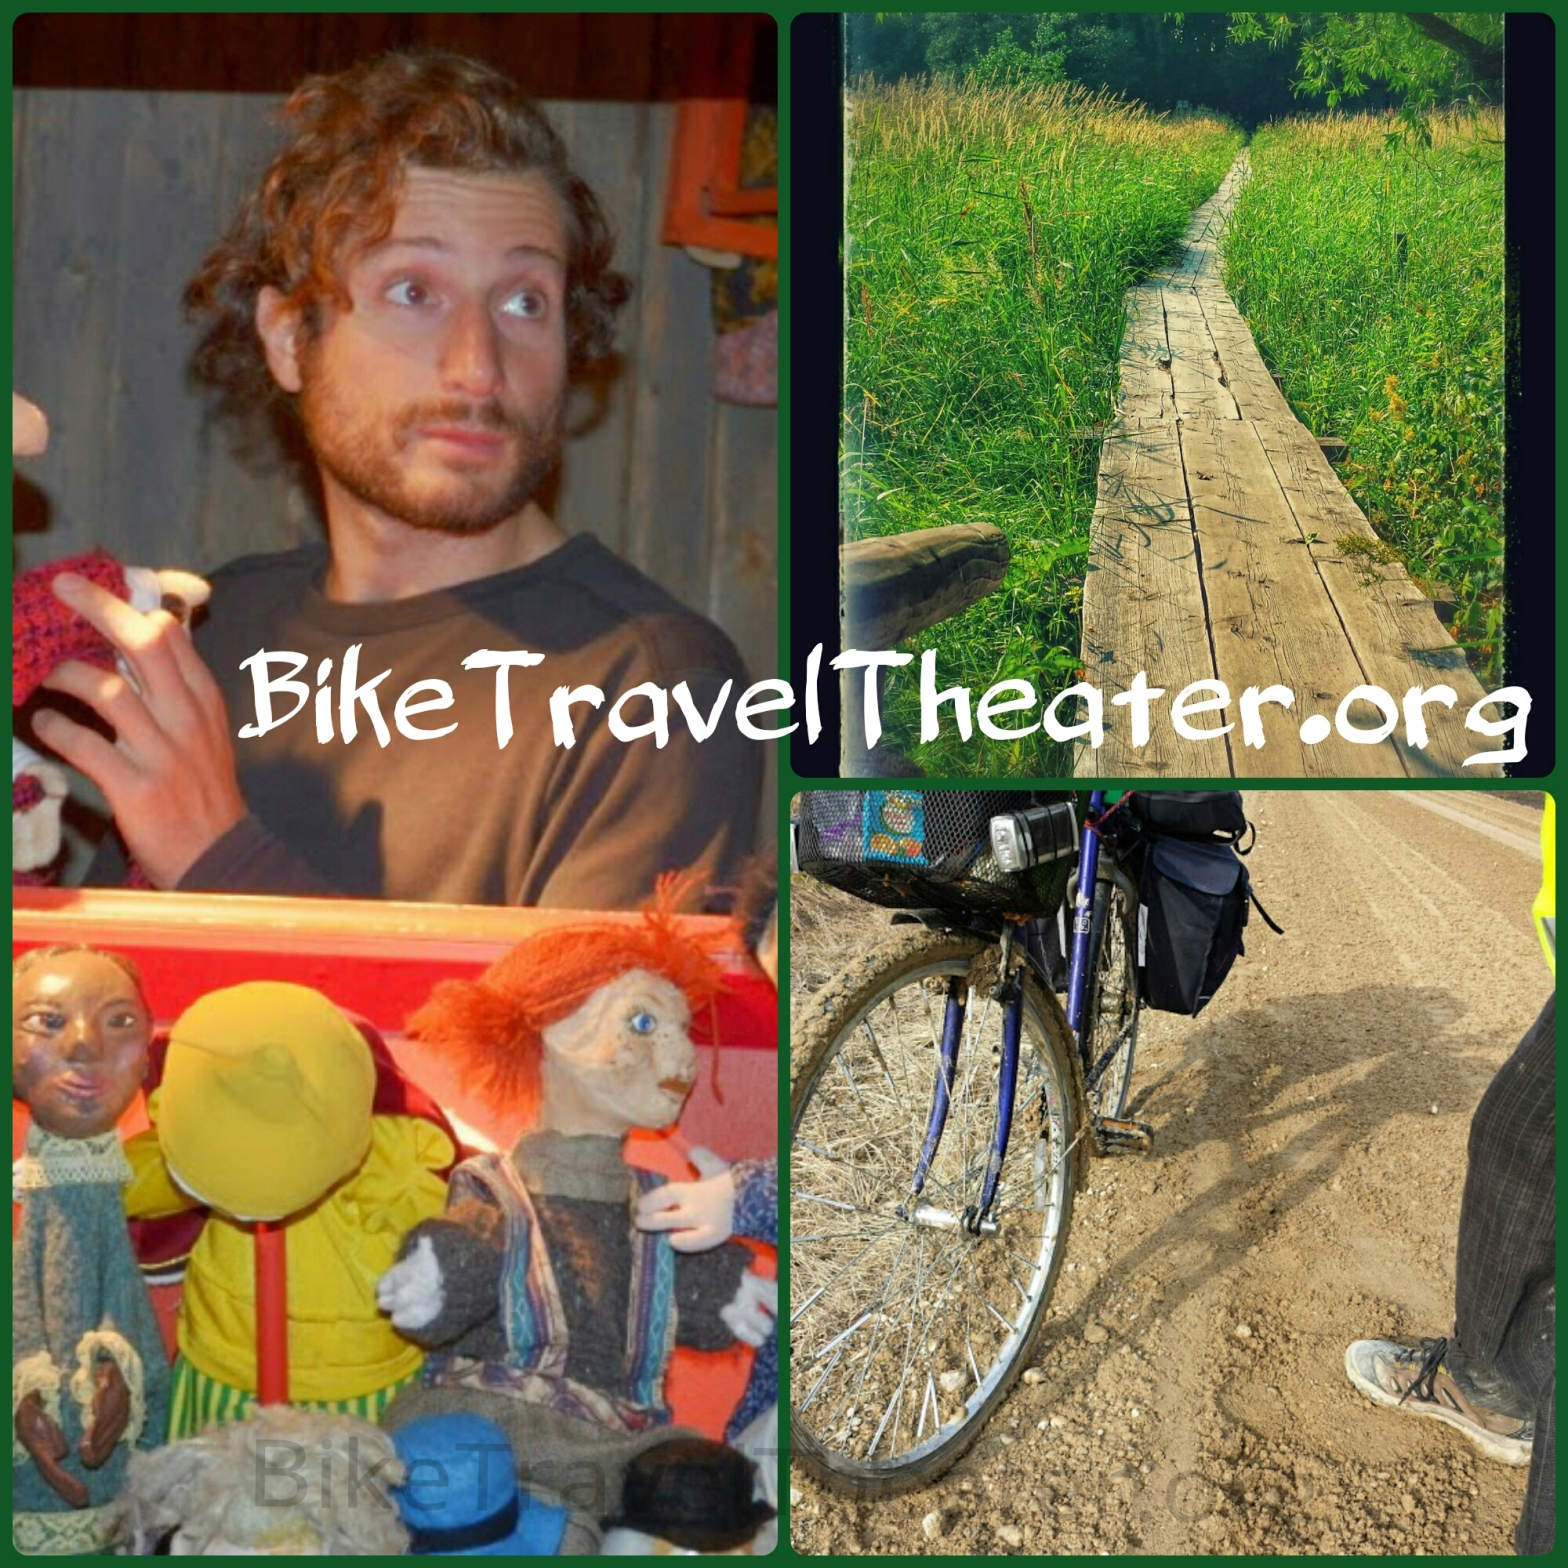 Luca's face, puppet, bike & nature